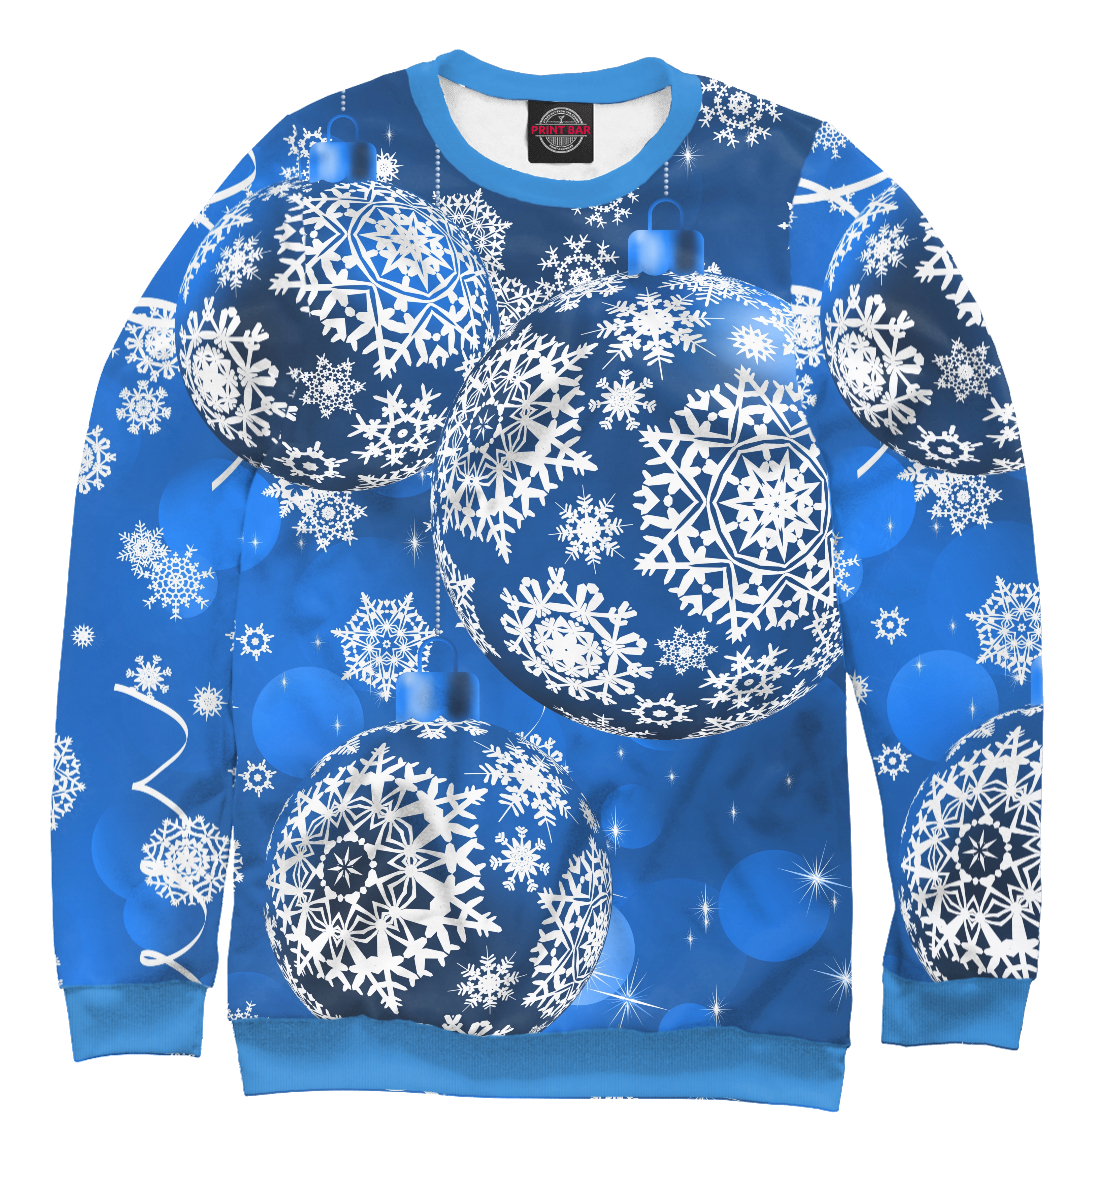 Купить Новогоднее чудо, Printbar, Свитшоты, NYV-294156-swi-1